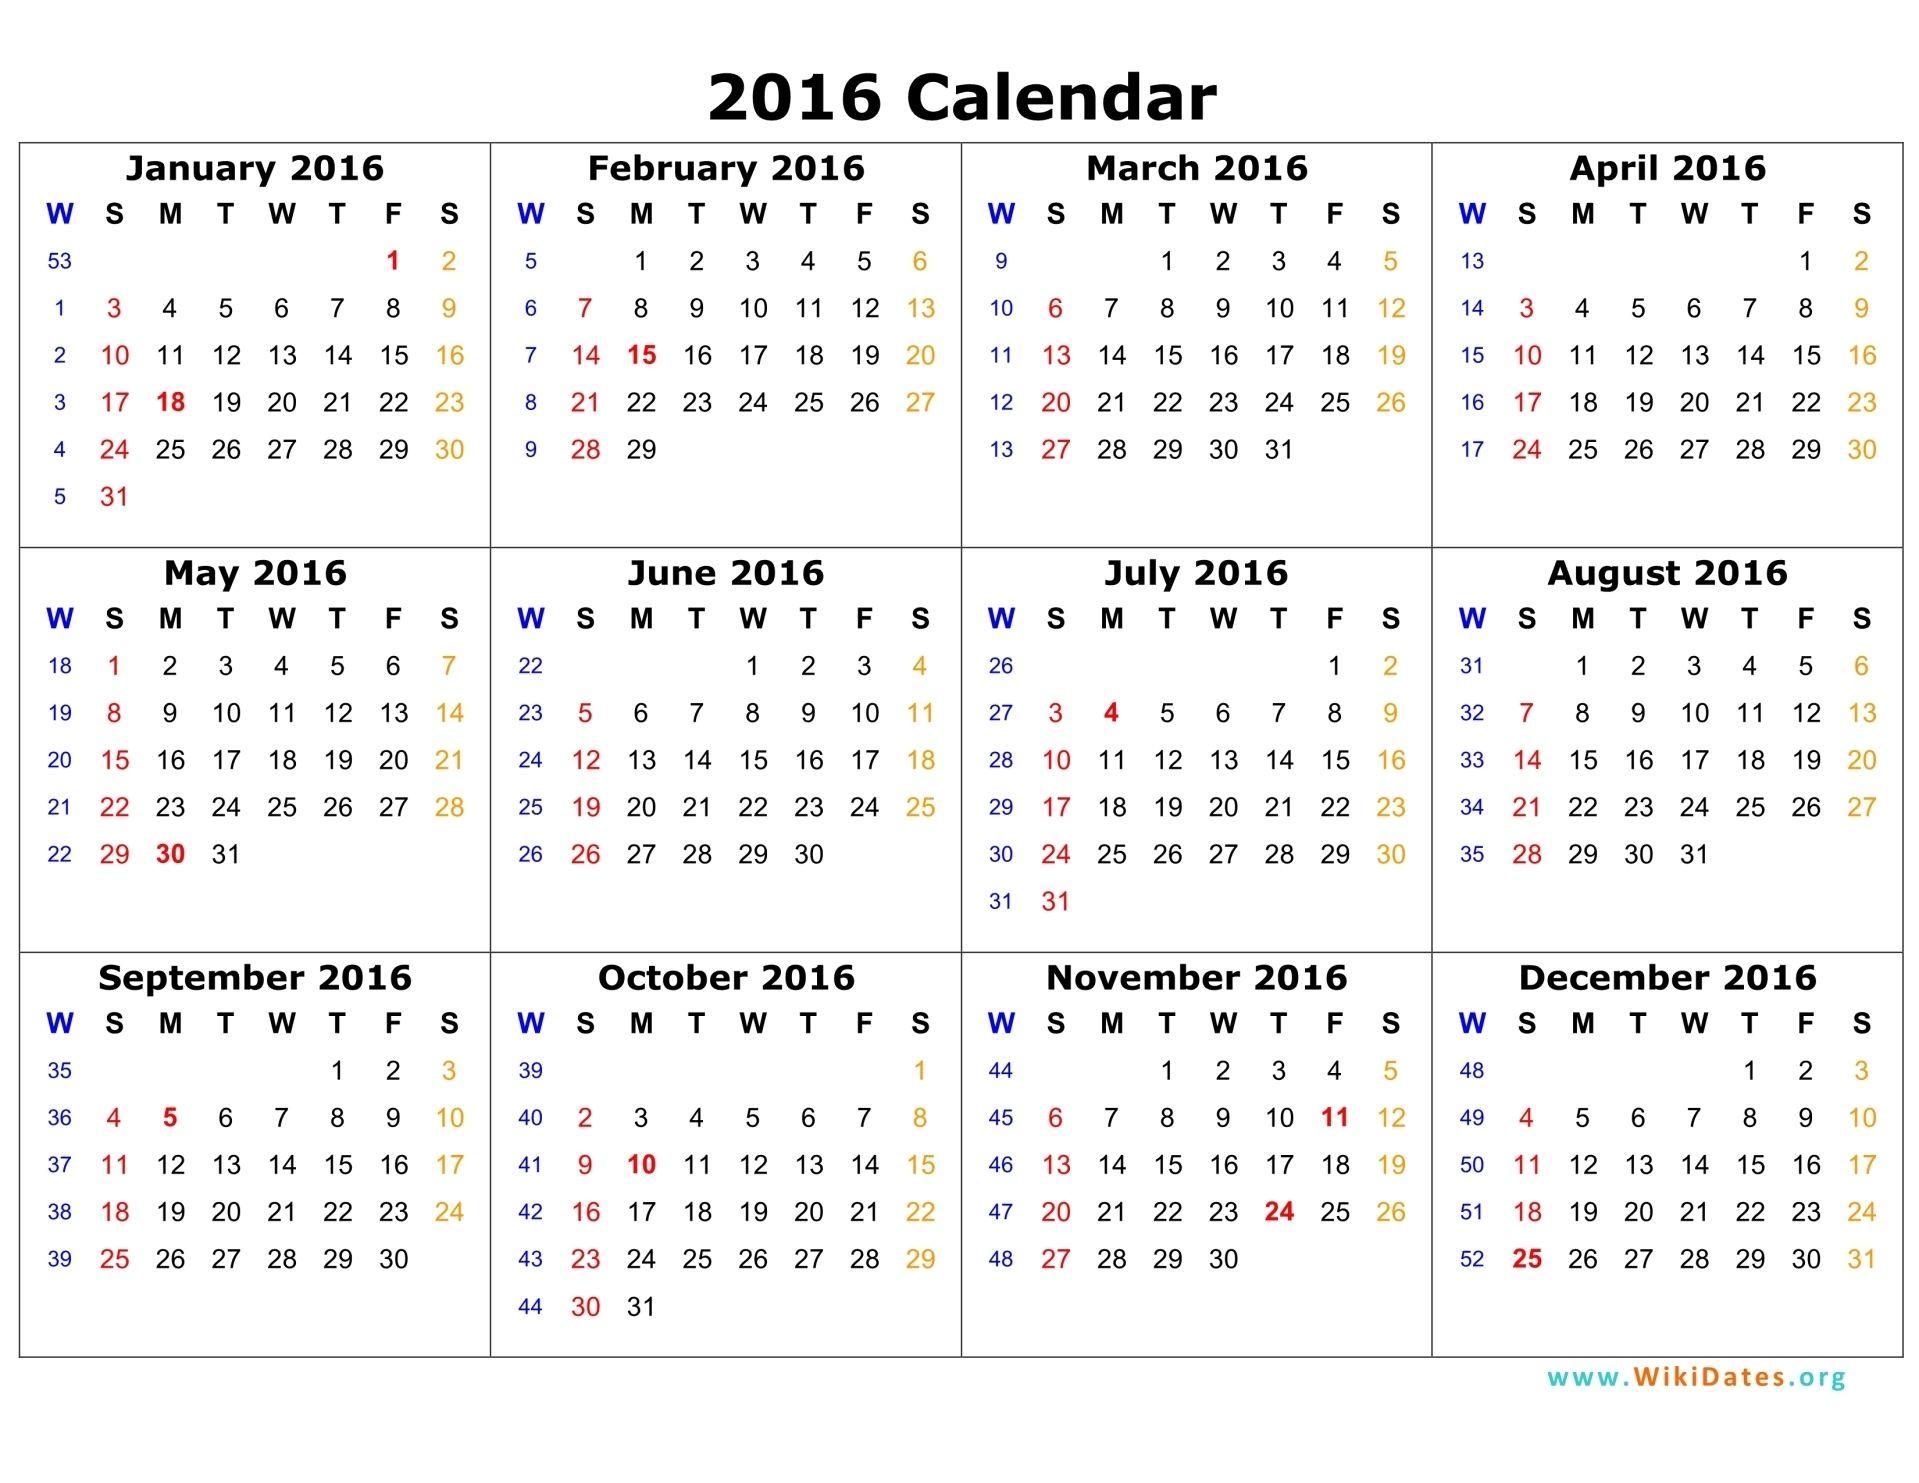 April Calendar Education World : Calendar template education world pinterest